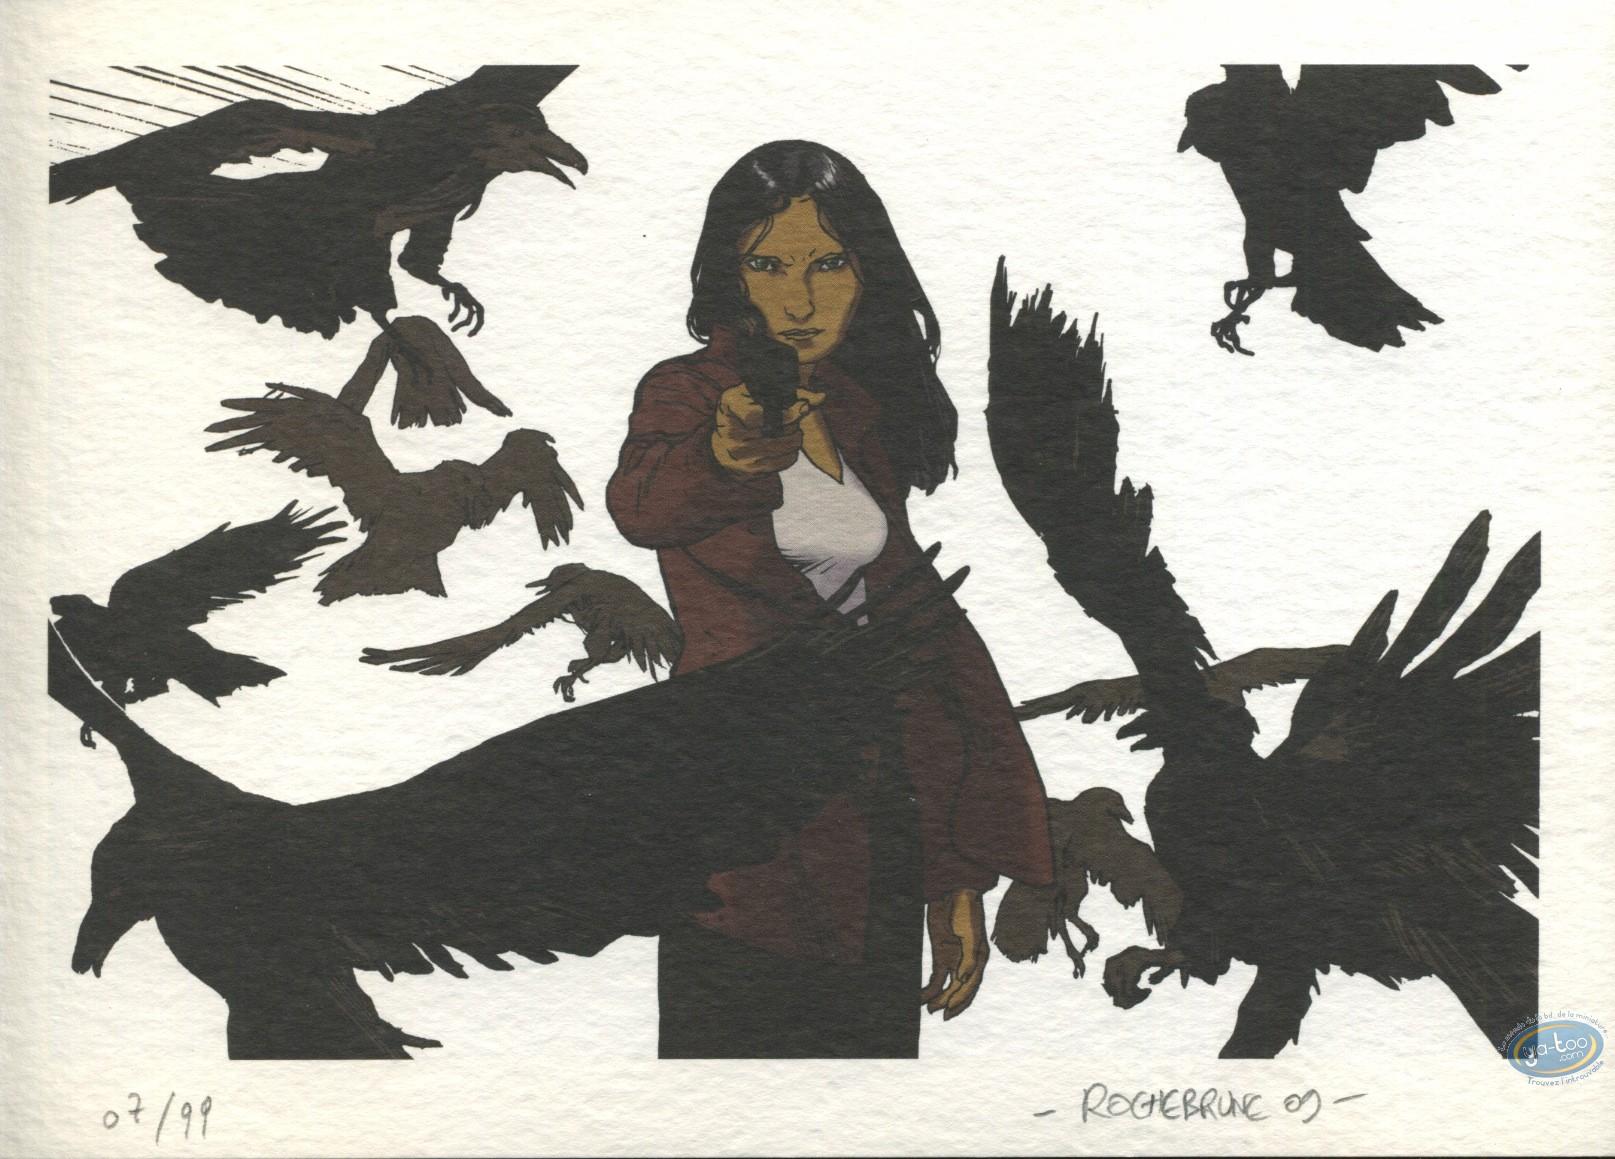 Bookplate Offset, Chemins de Vadstena (les) : Woman with a gun & birds